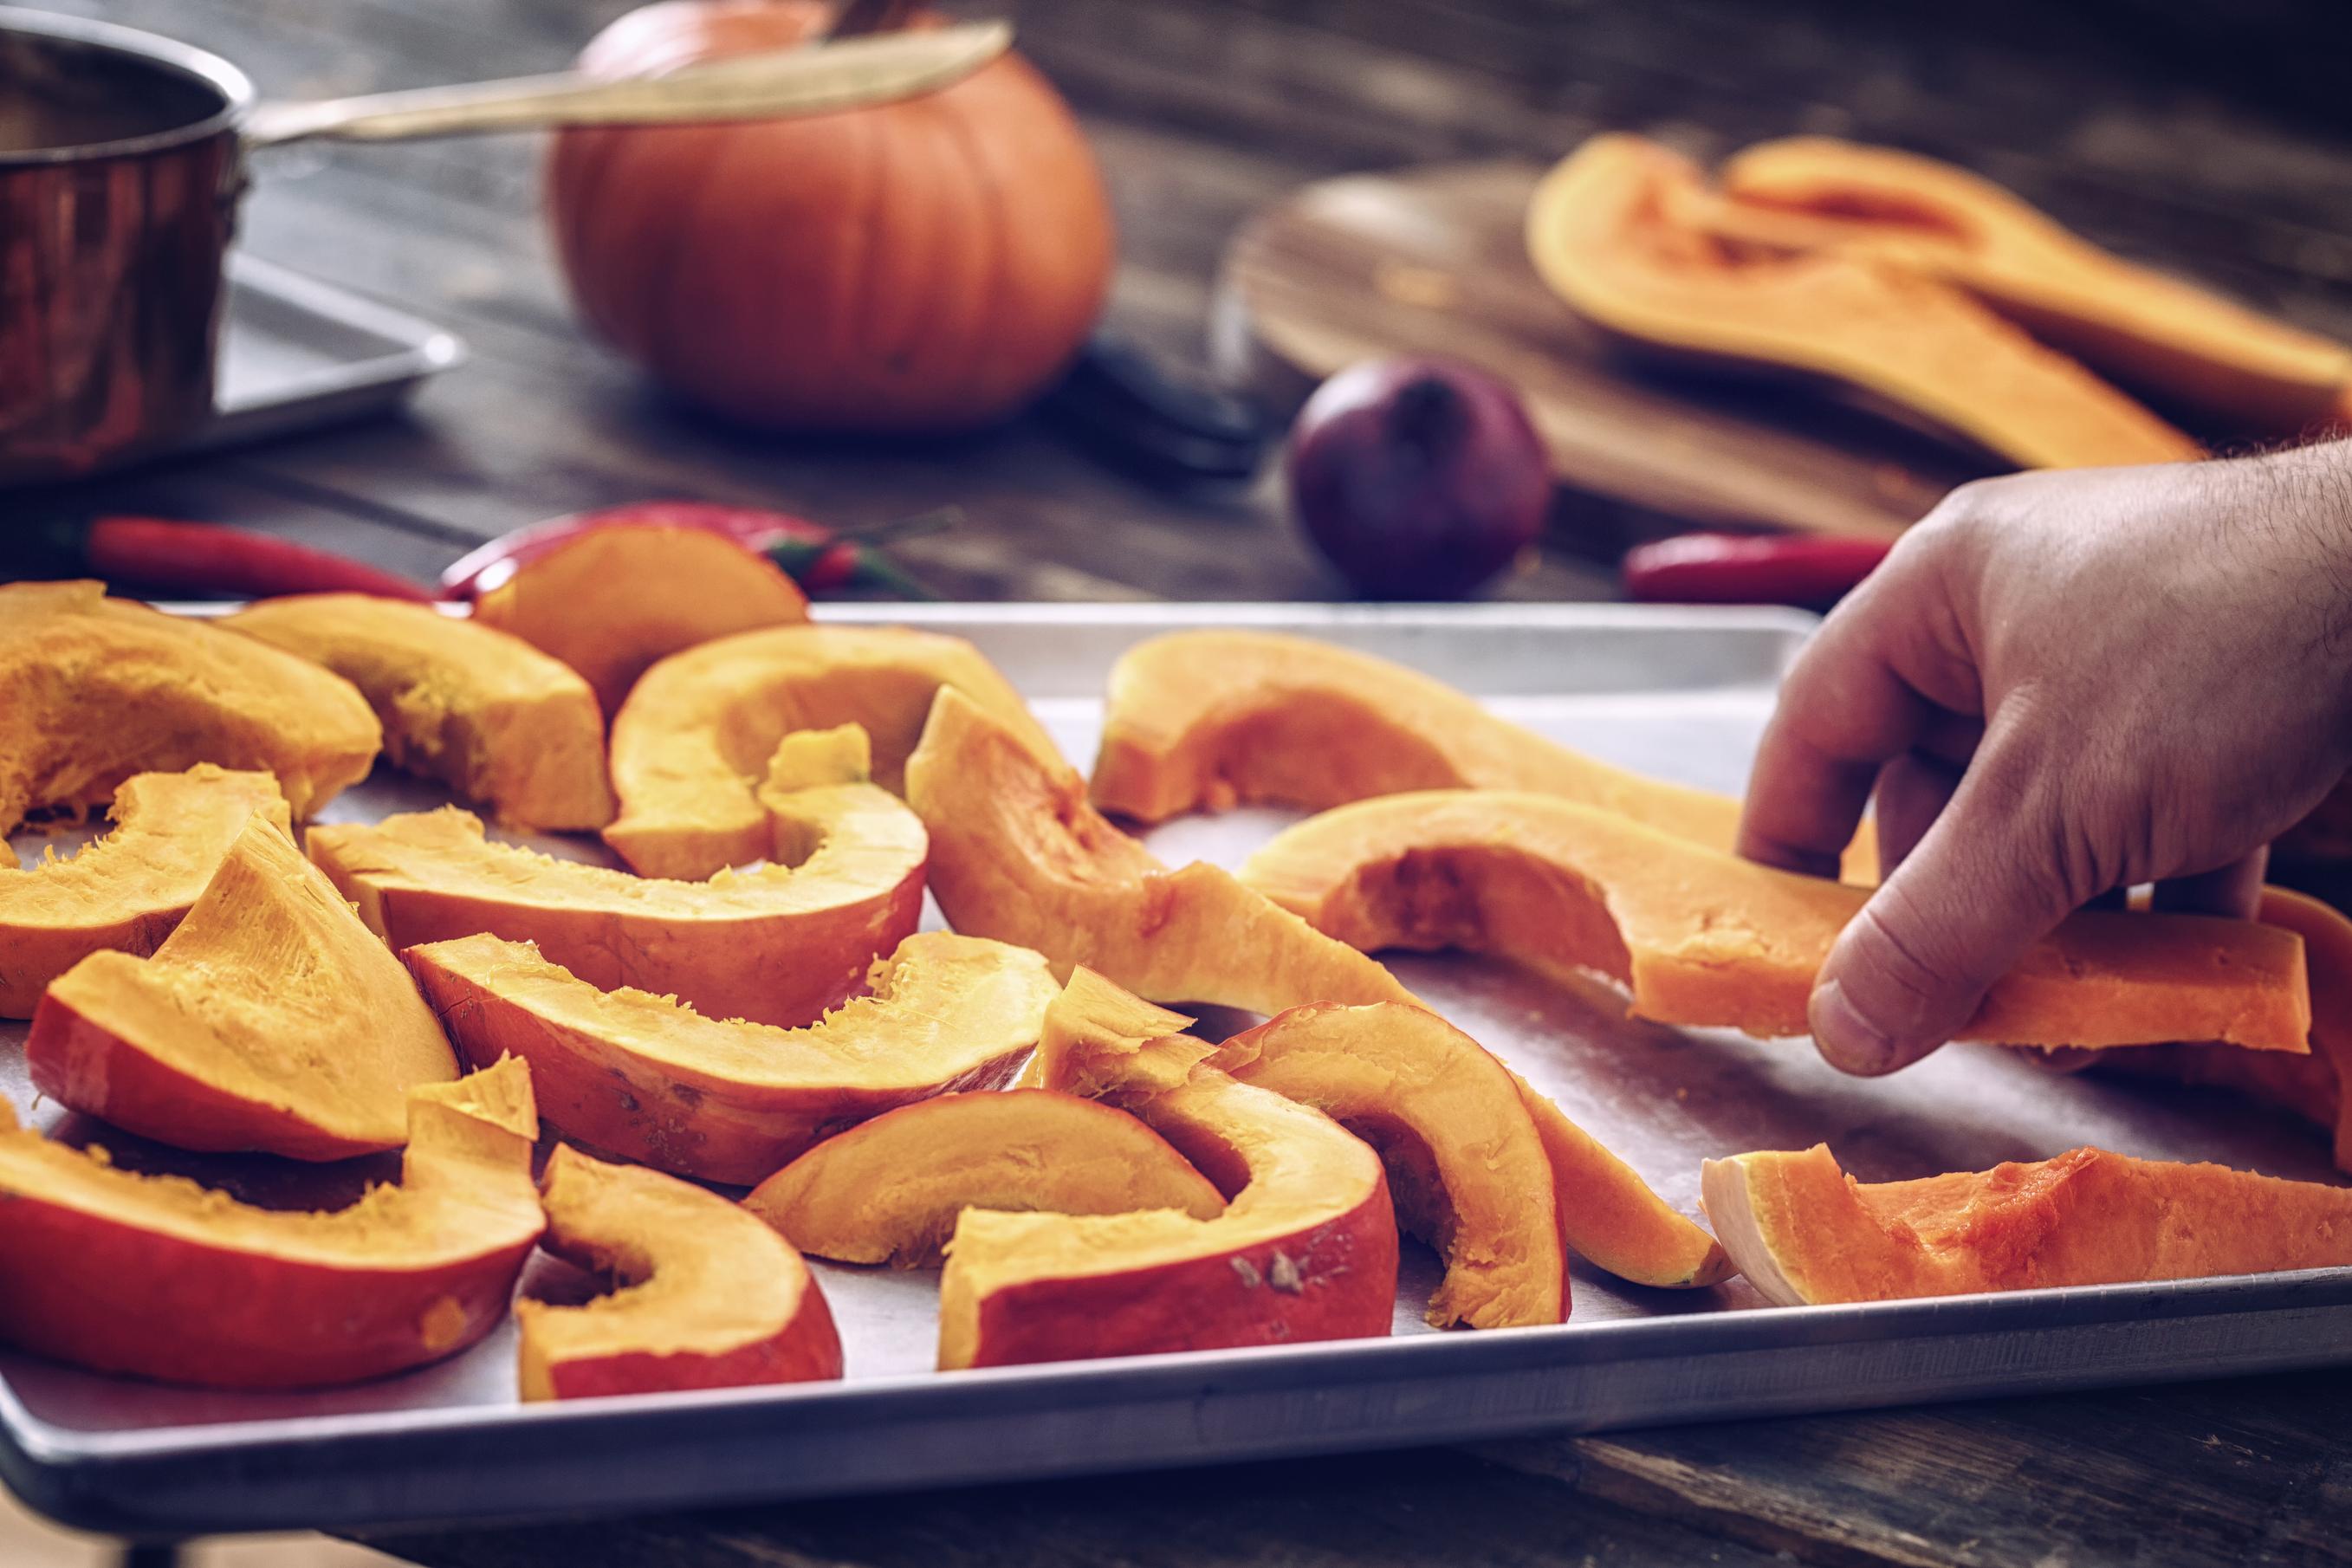 Sliced pumpkin on a baking sheet for roasting.